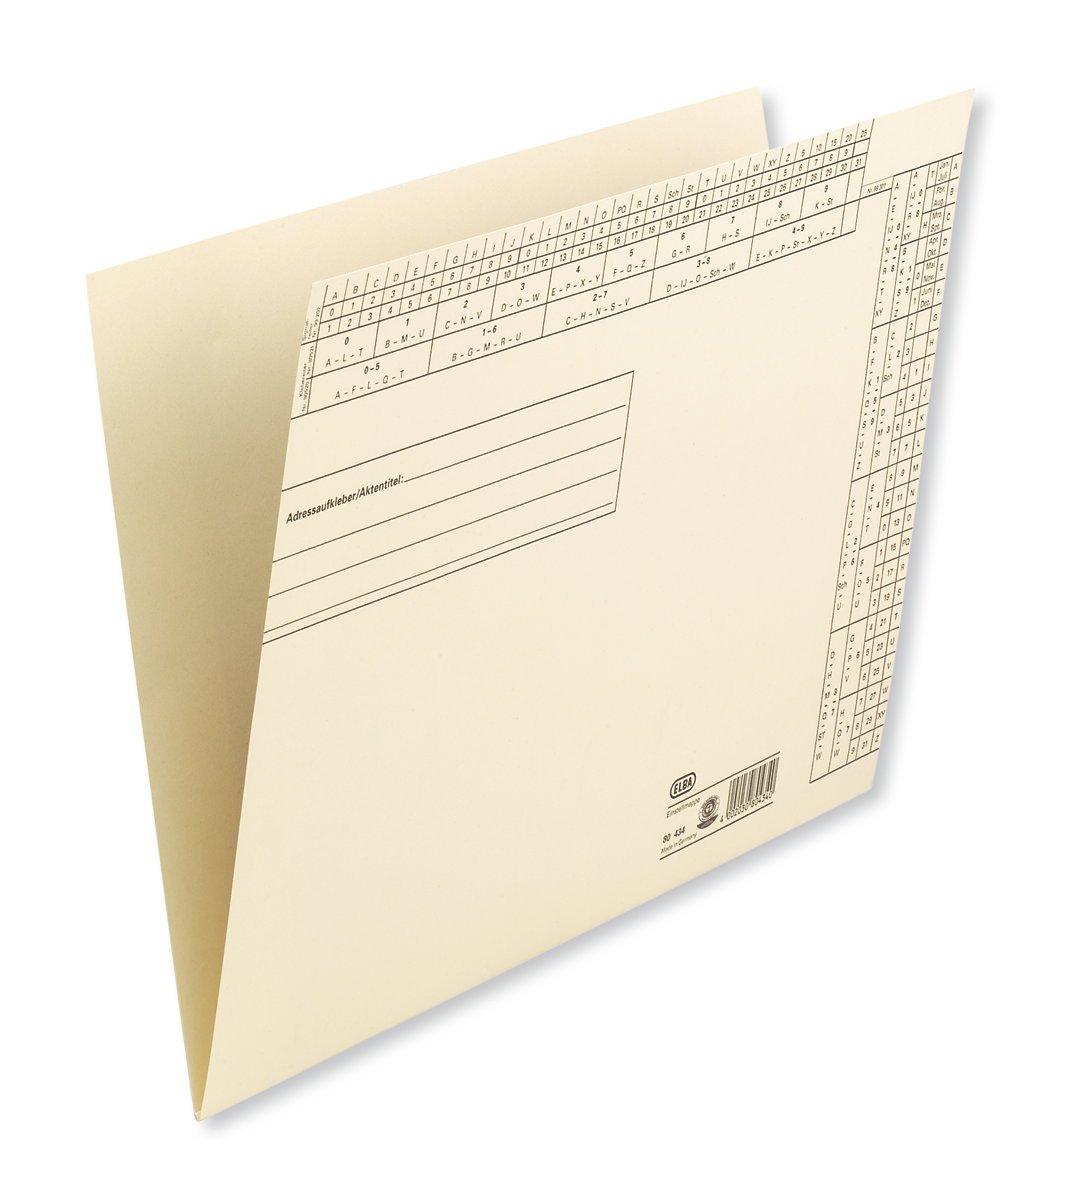 Elba 80434 Lot de 50 dossiers en suspendus en dossiers papier craft Chamois 883f6d